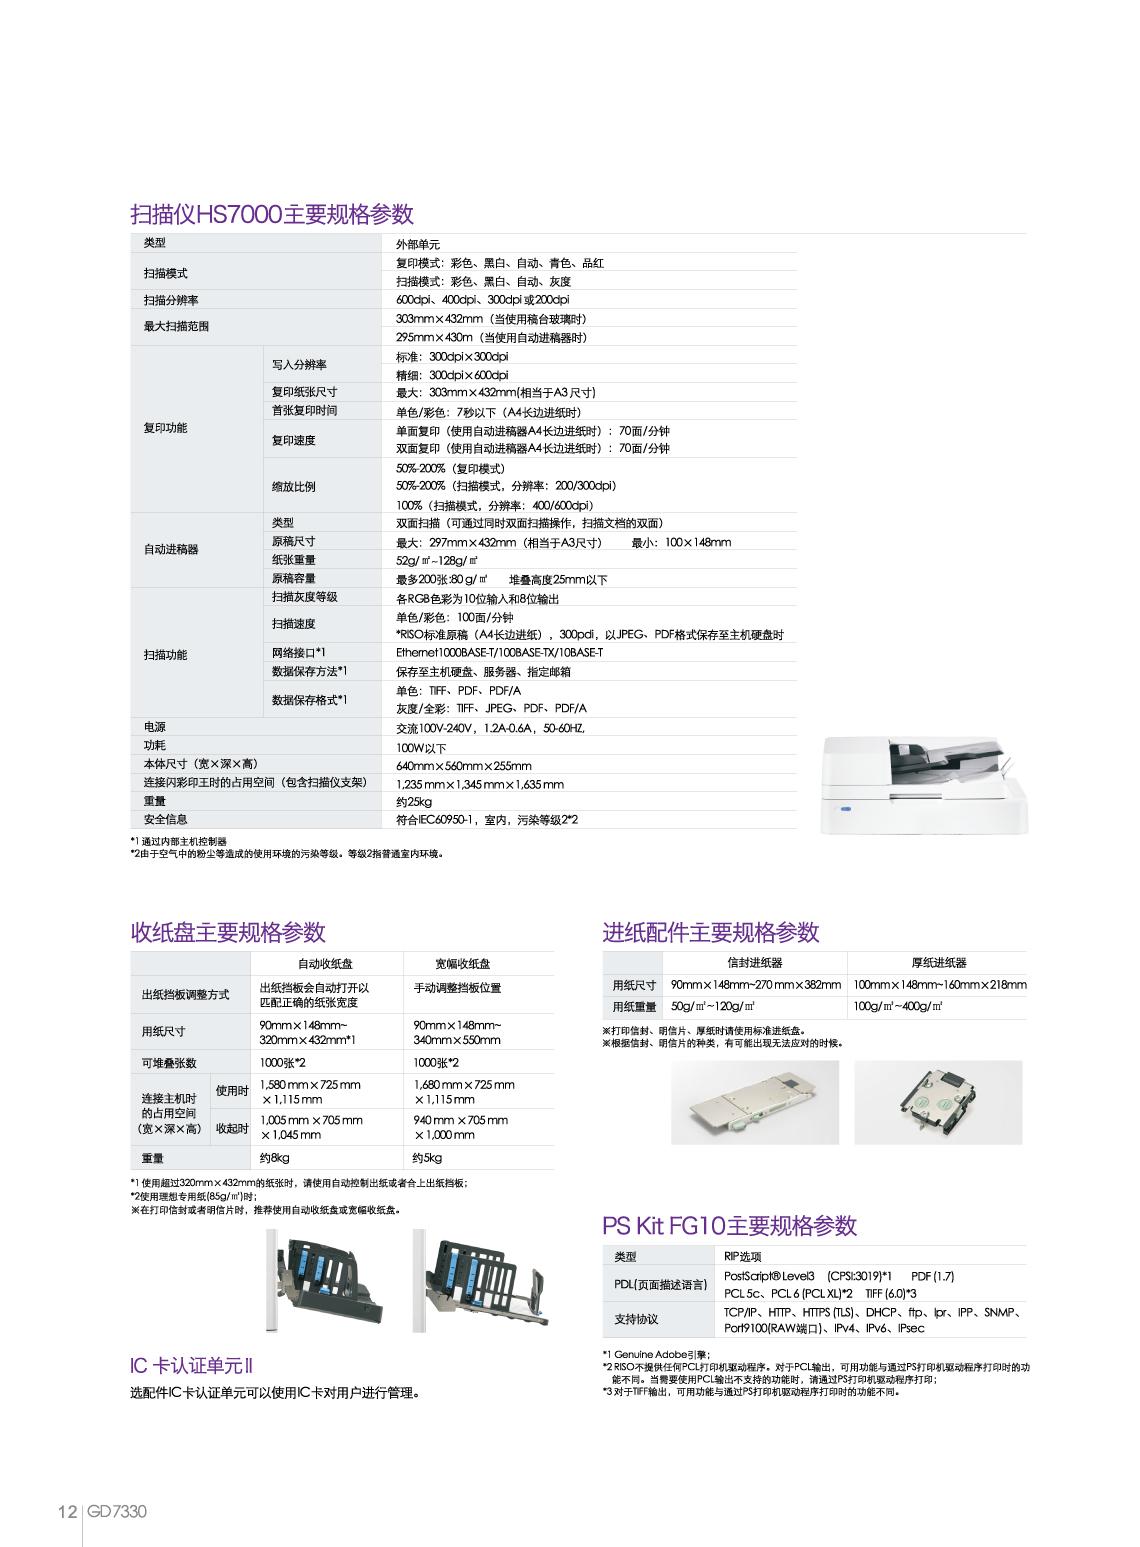 GD7330-14.jpg